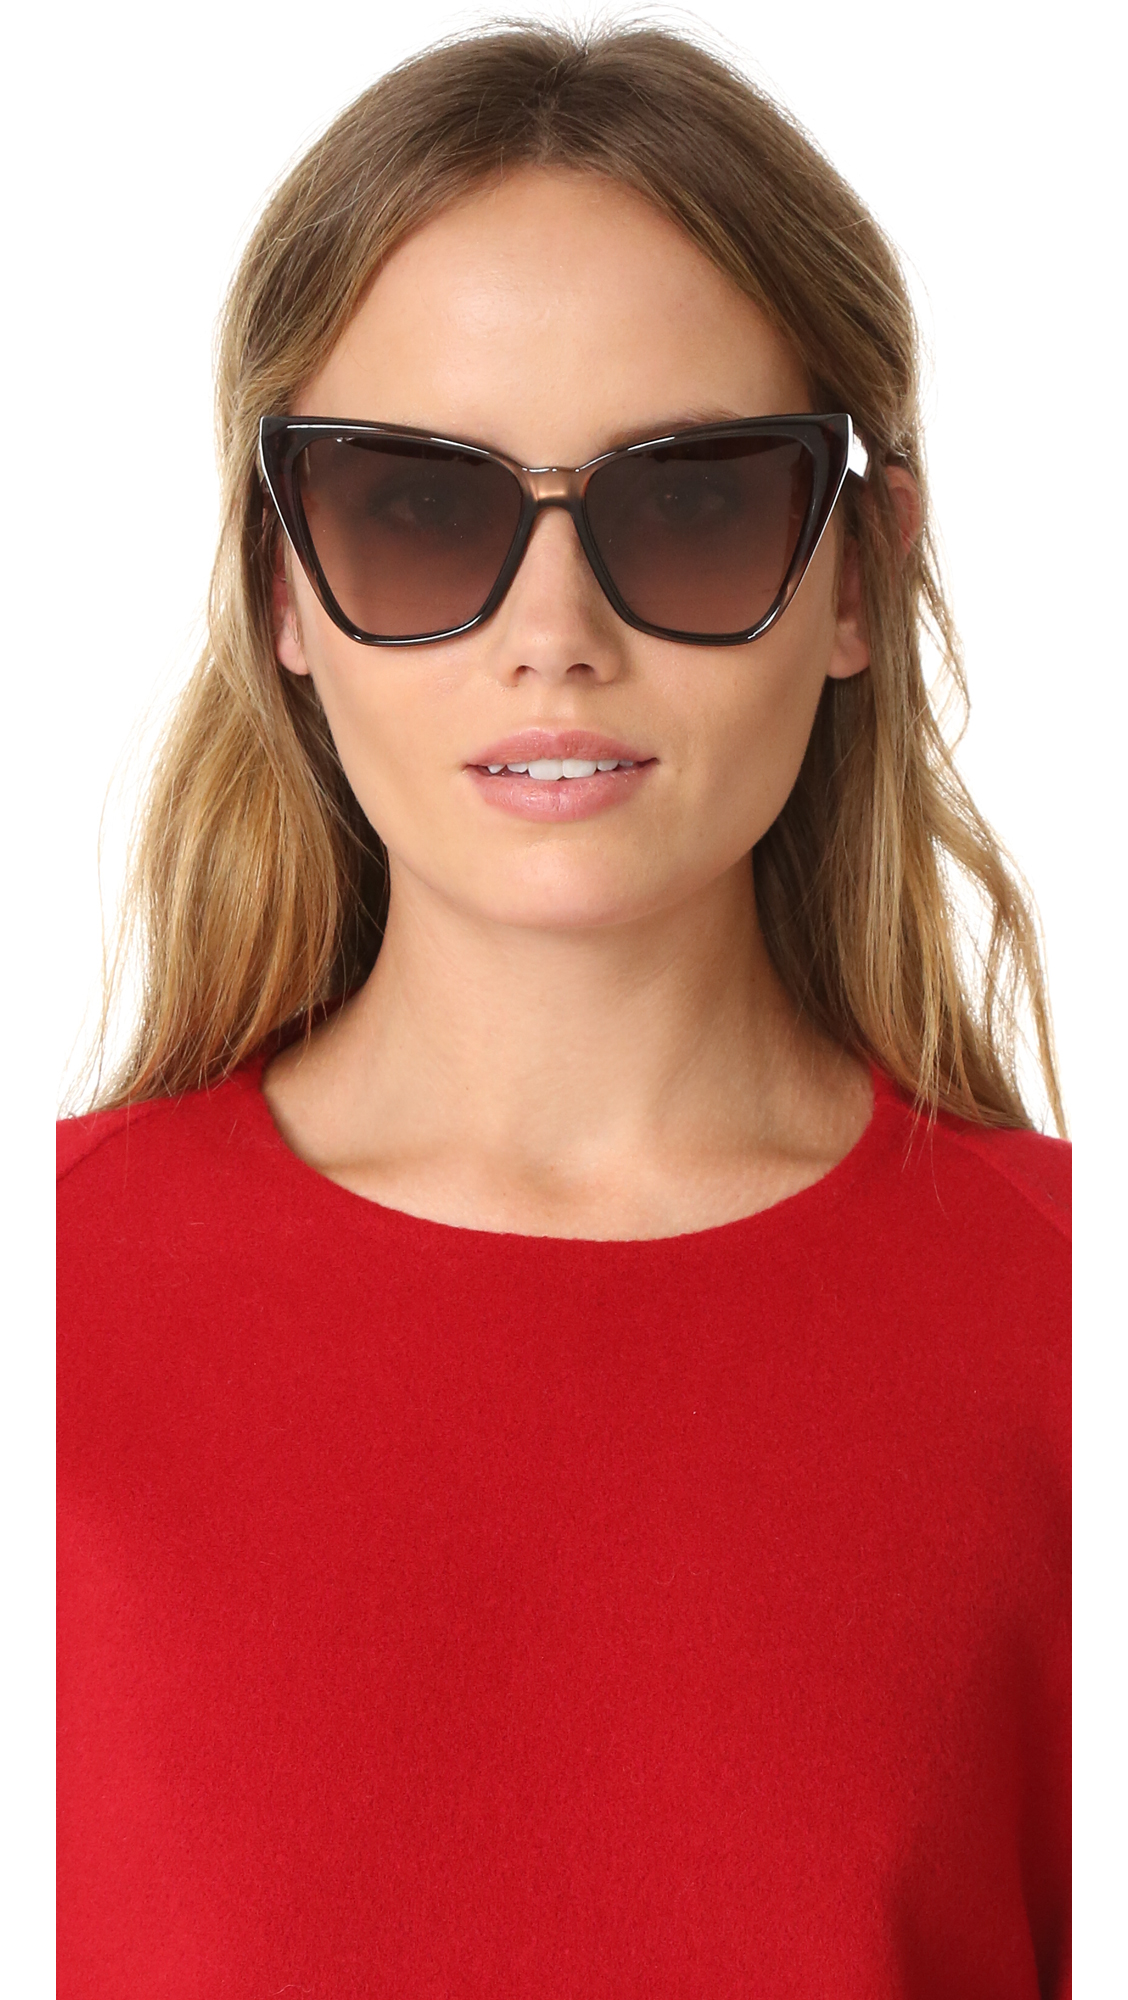 a60d0f0074bec Givenchy Cat Eye Sunglasses